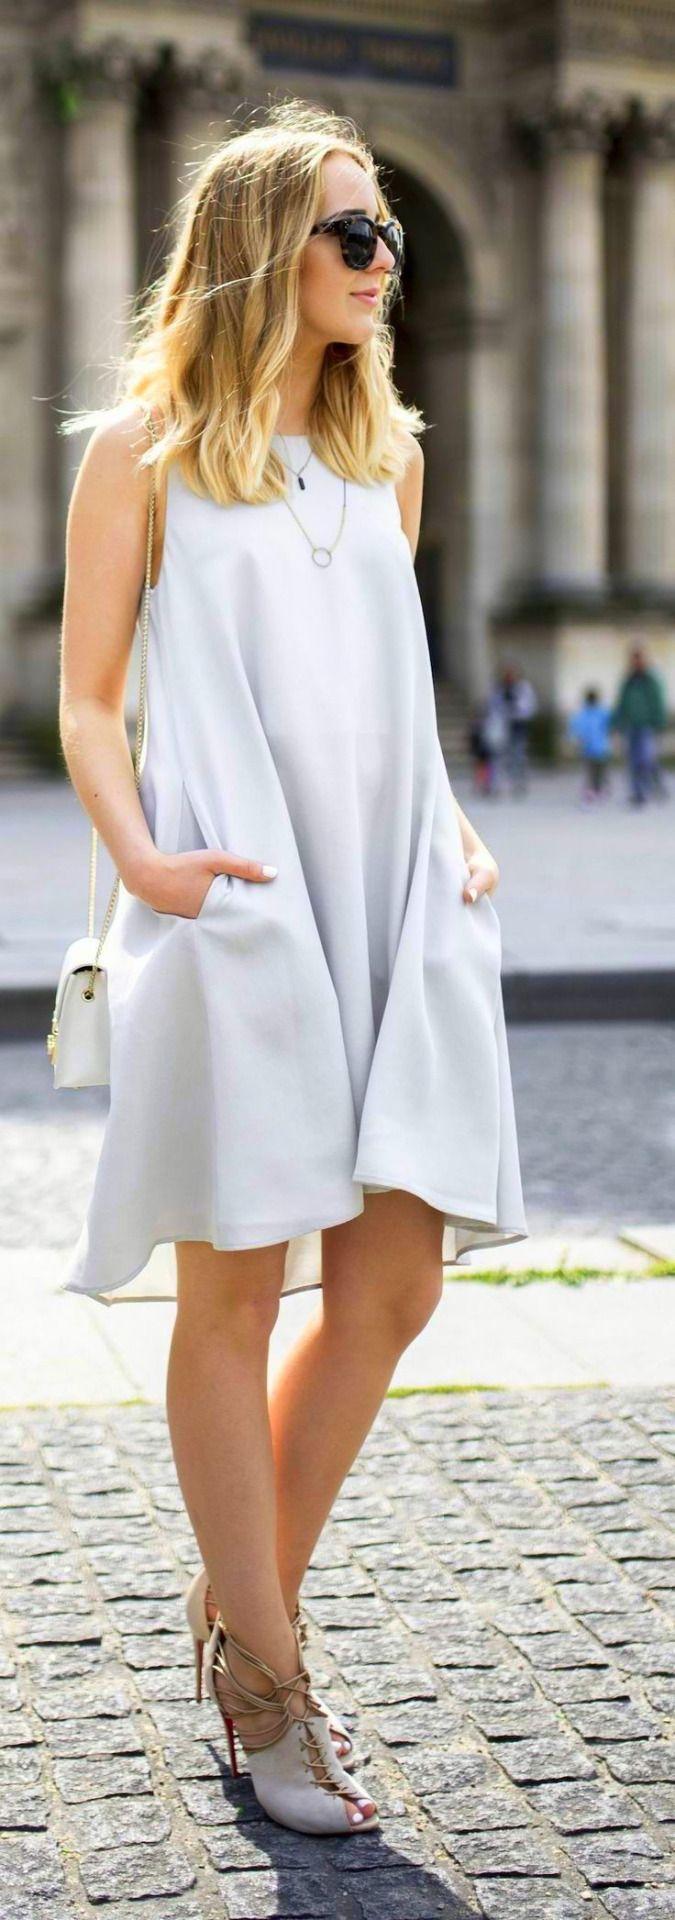 Asemmetrical Tent Dress w/pockets